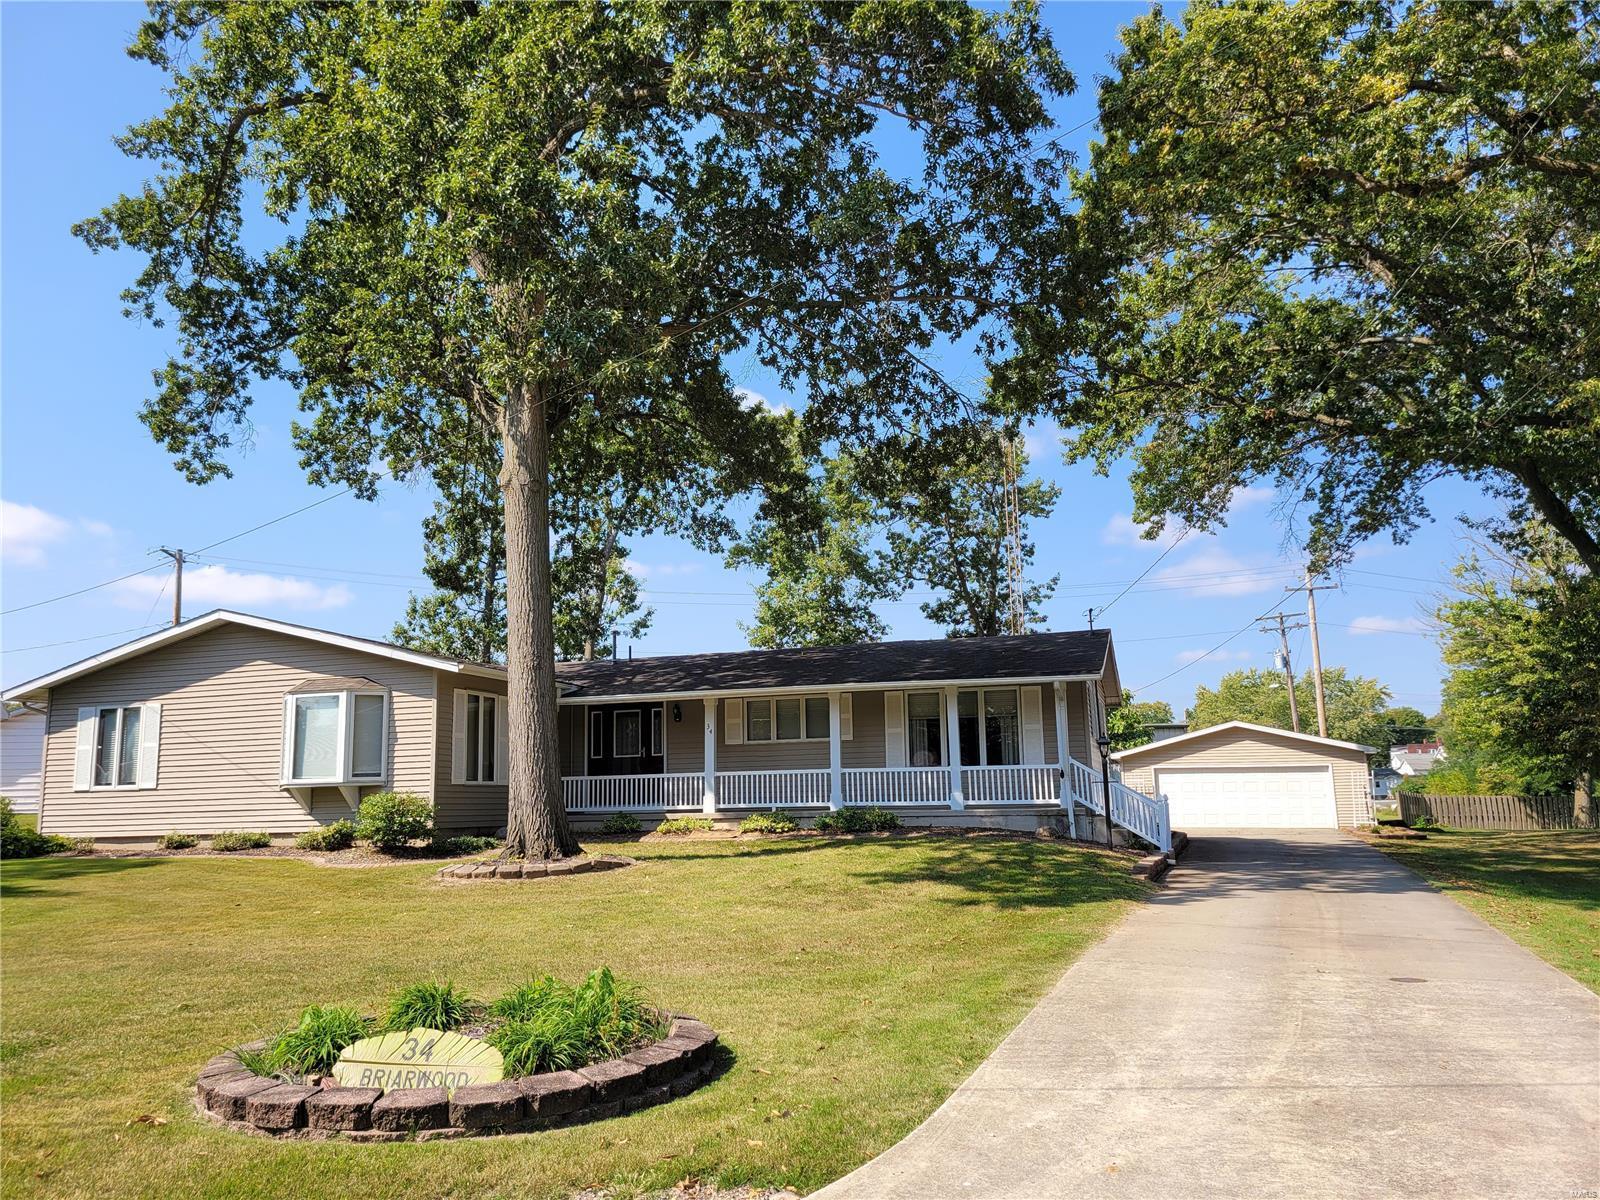 34 Briarwood Drive Property Photo - Hillsboro, IL real estate listing